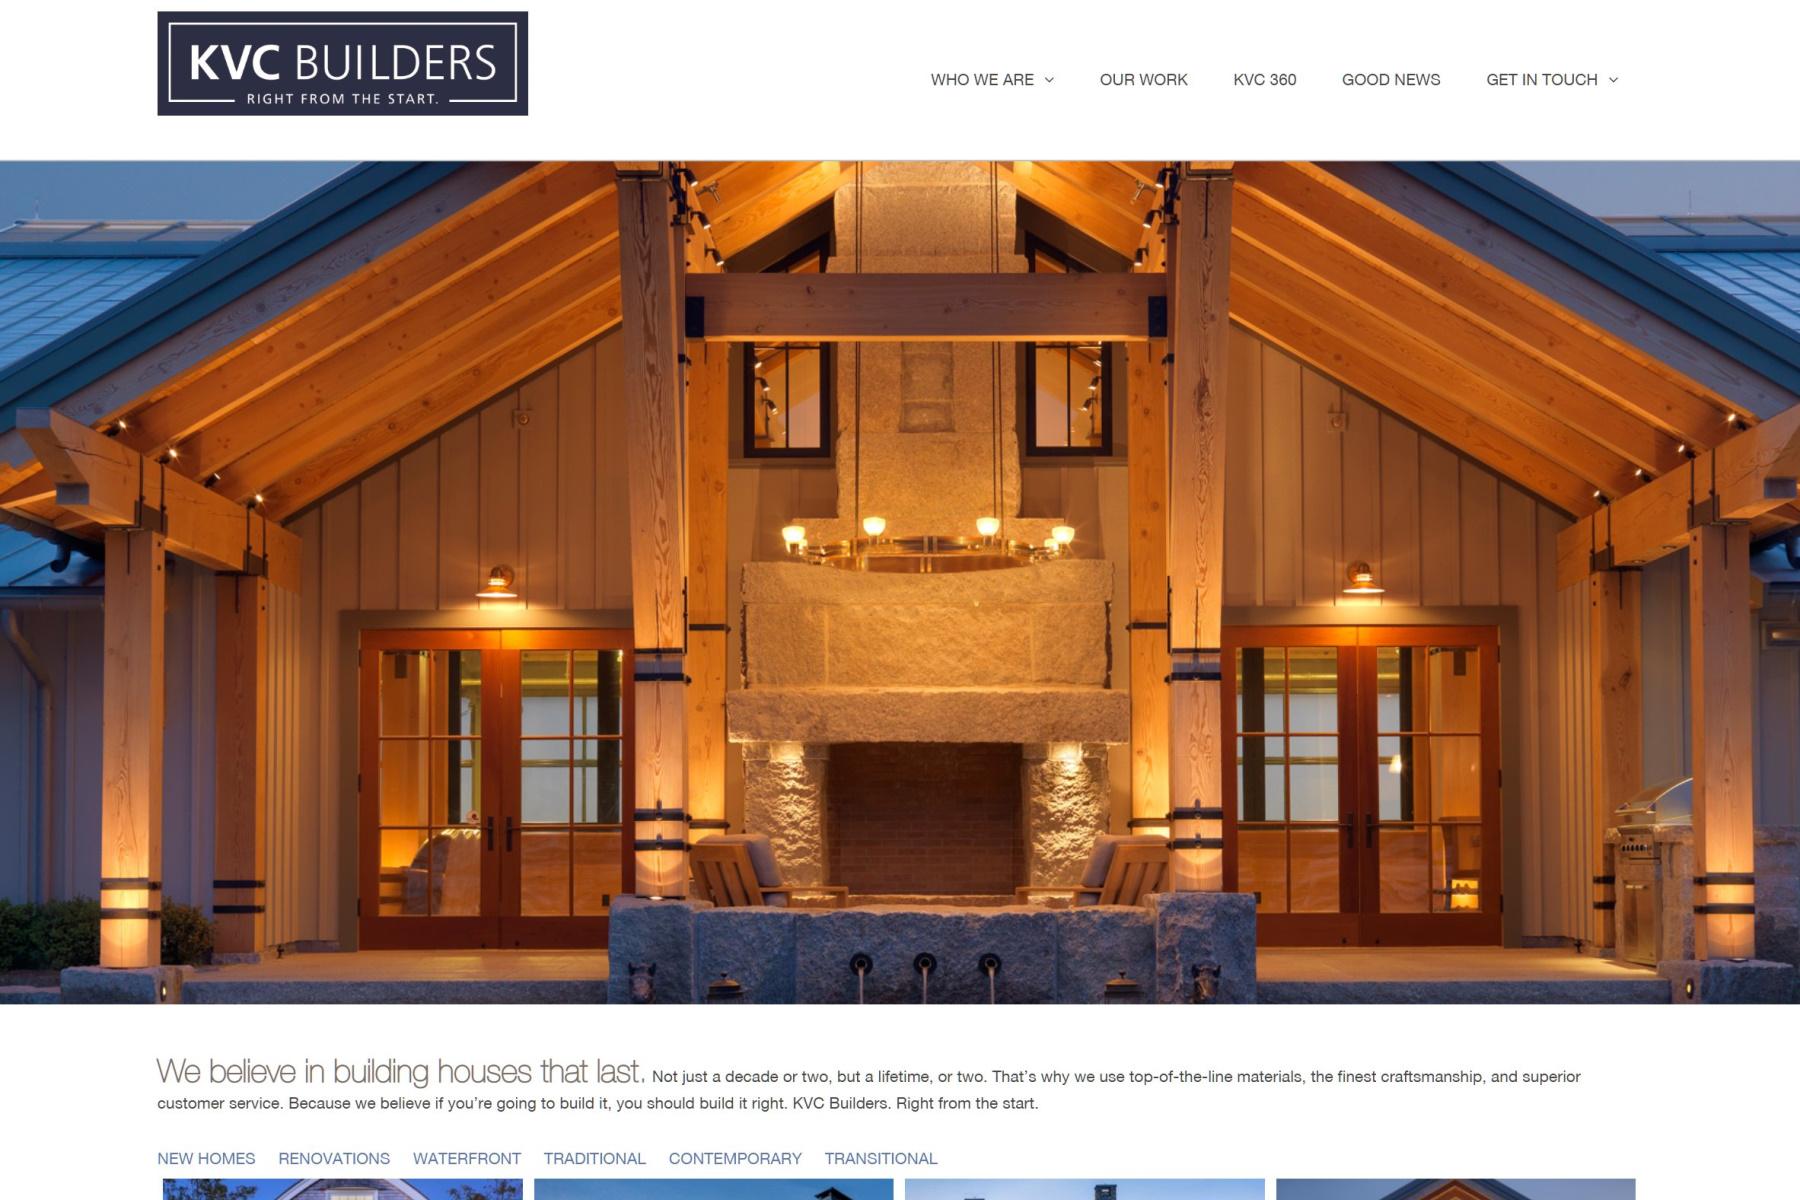 KVC Builders